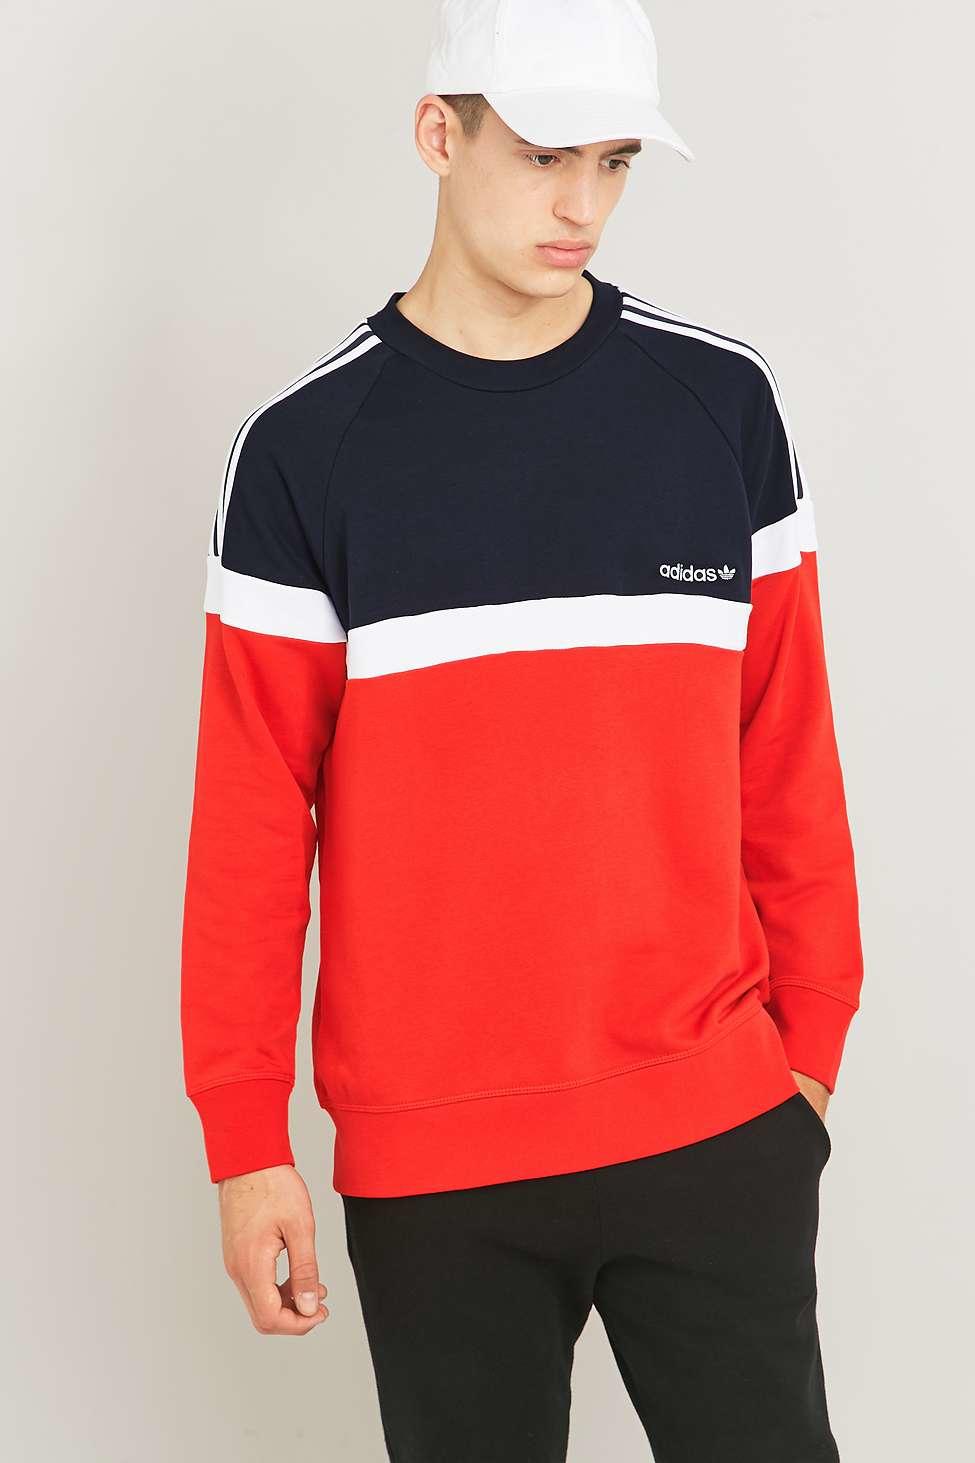 Crewneck Itasca Originals Vivid Adidas Men Sweatshirt For Red QxWoeBdCr